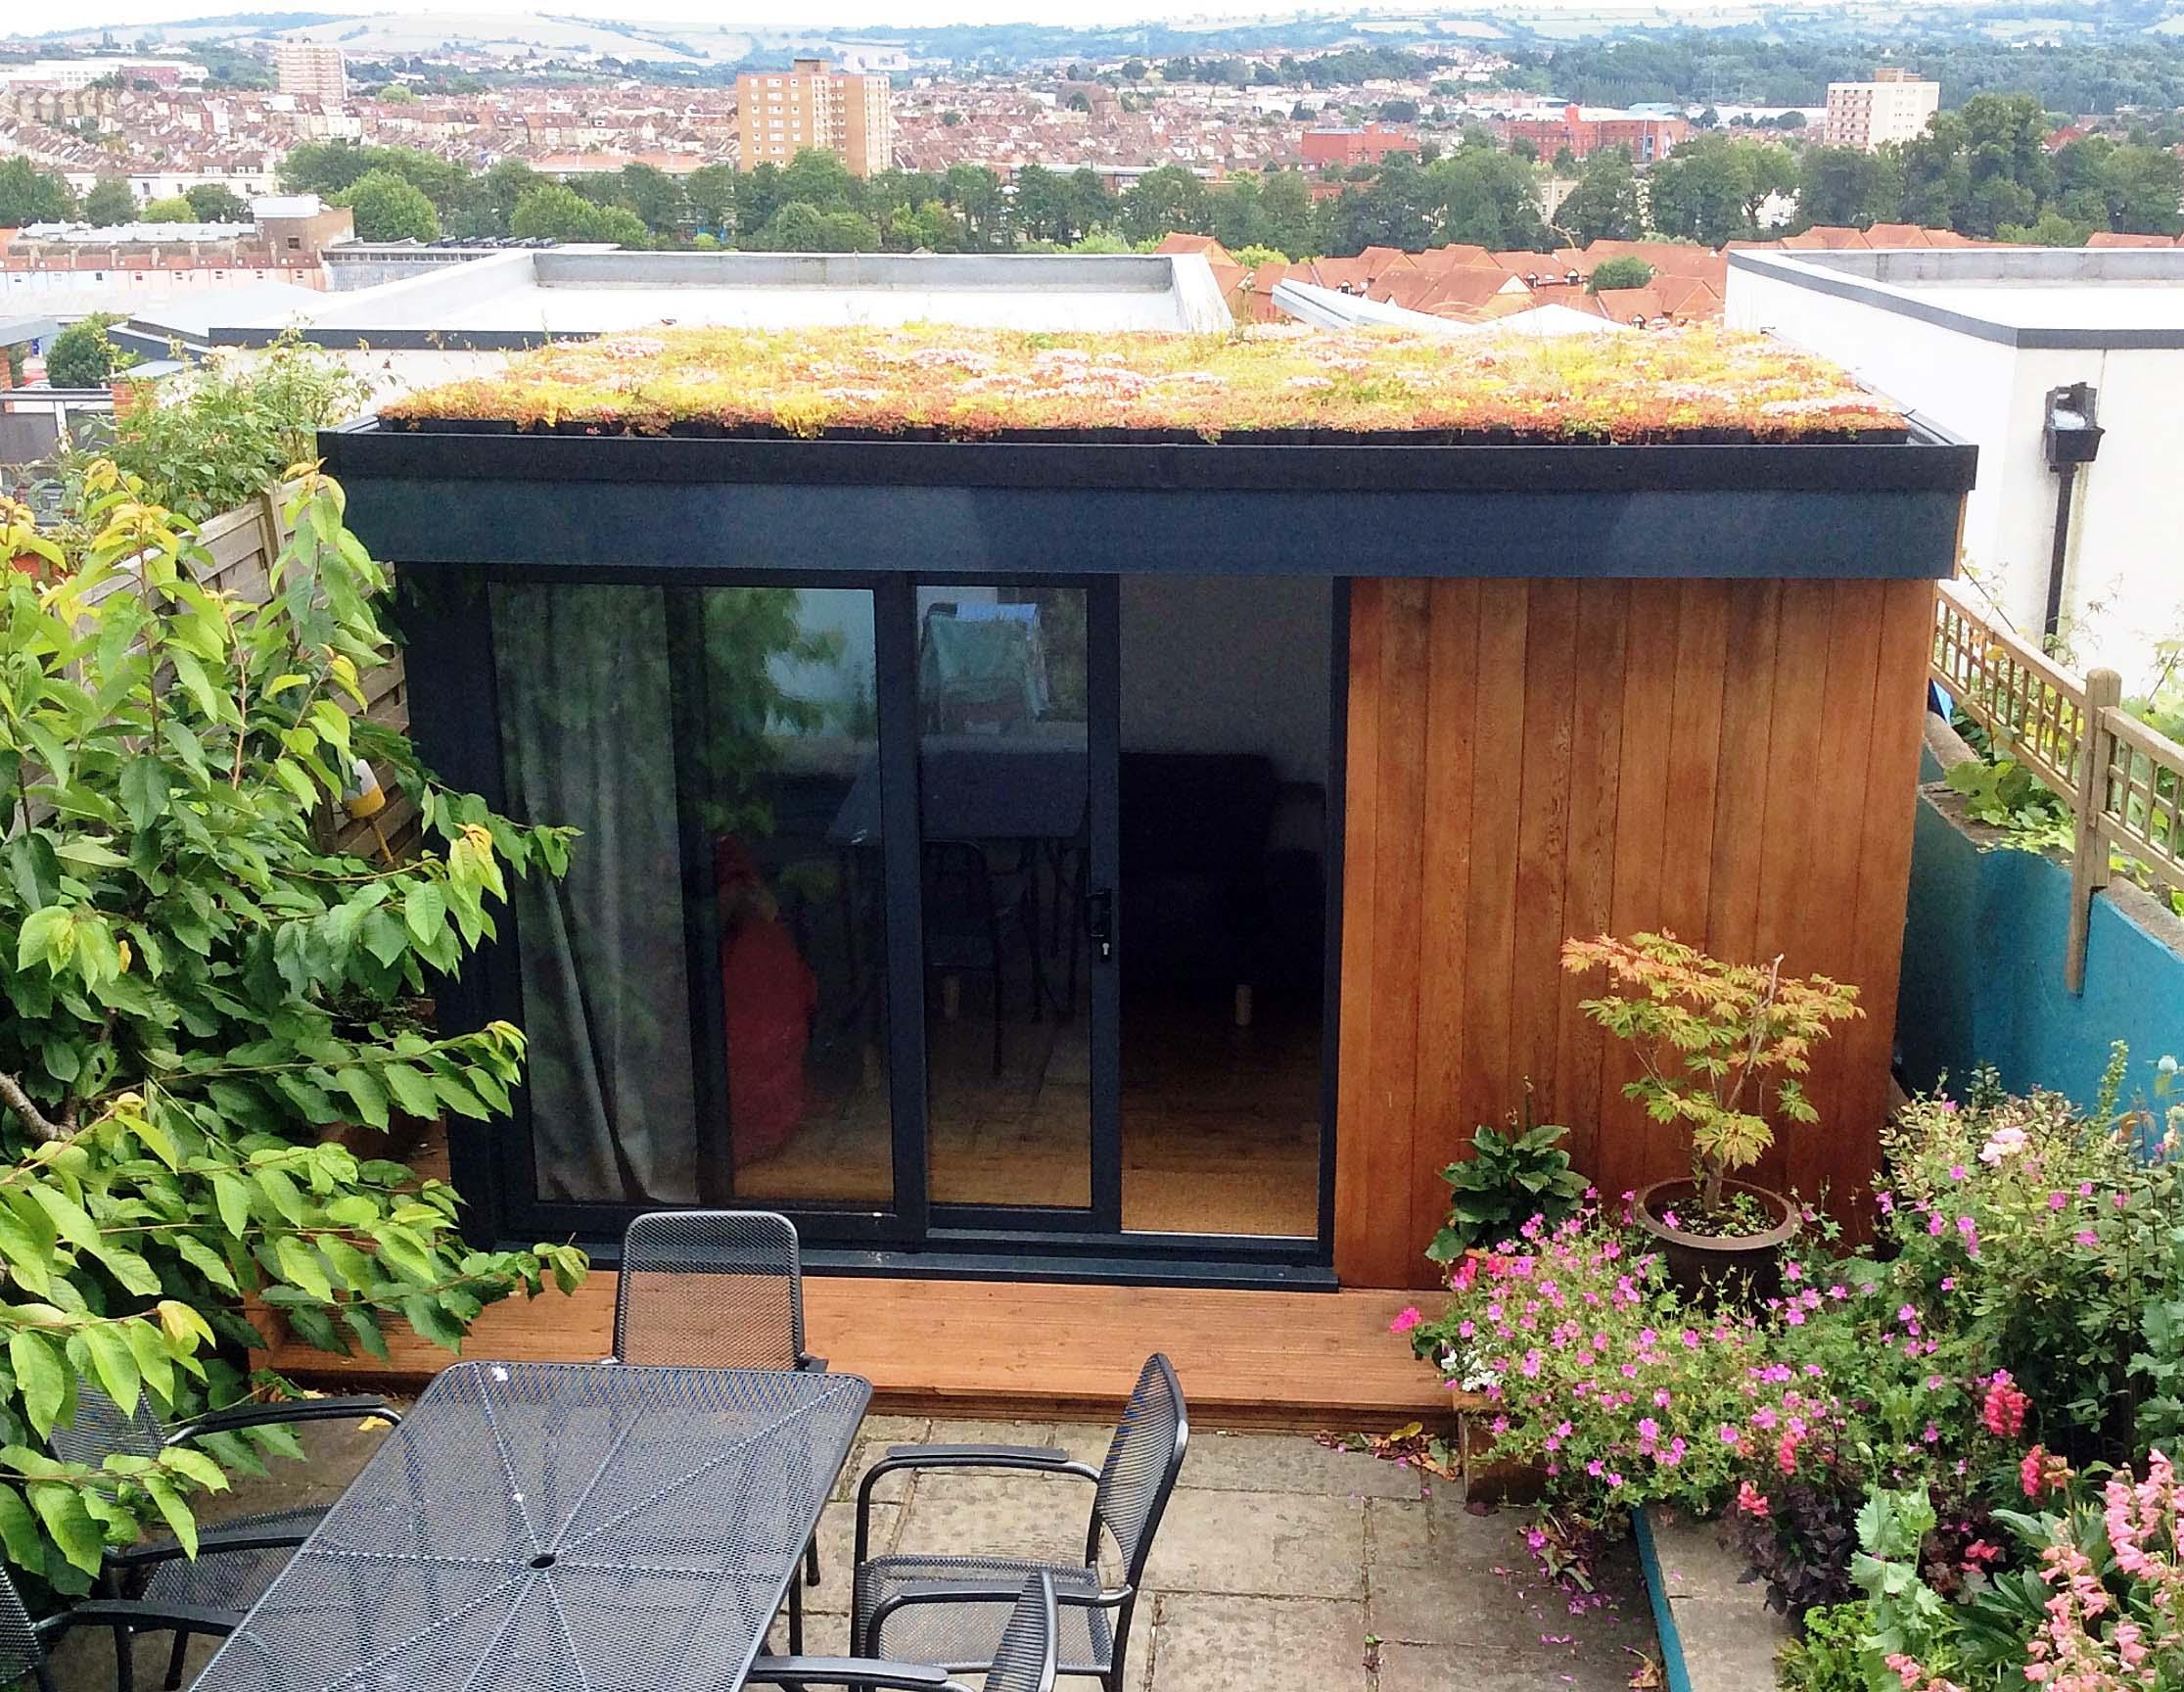 Small garden room with sedum roof